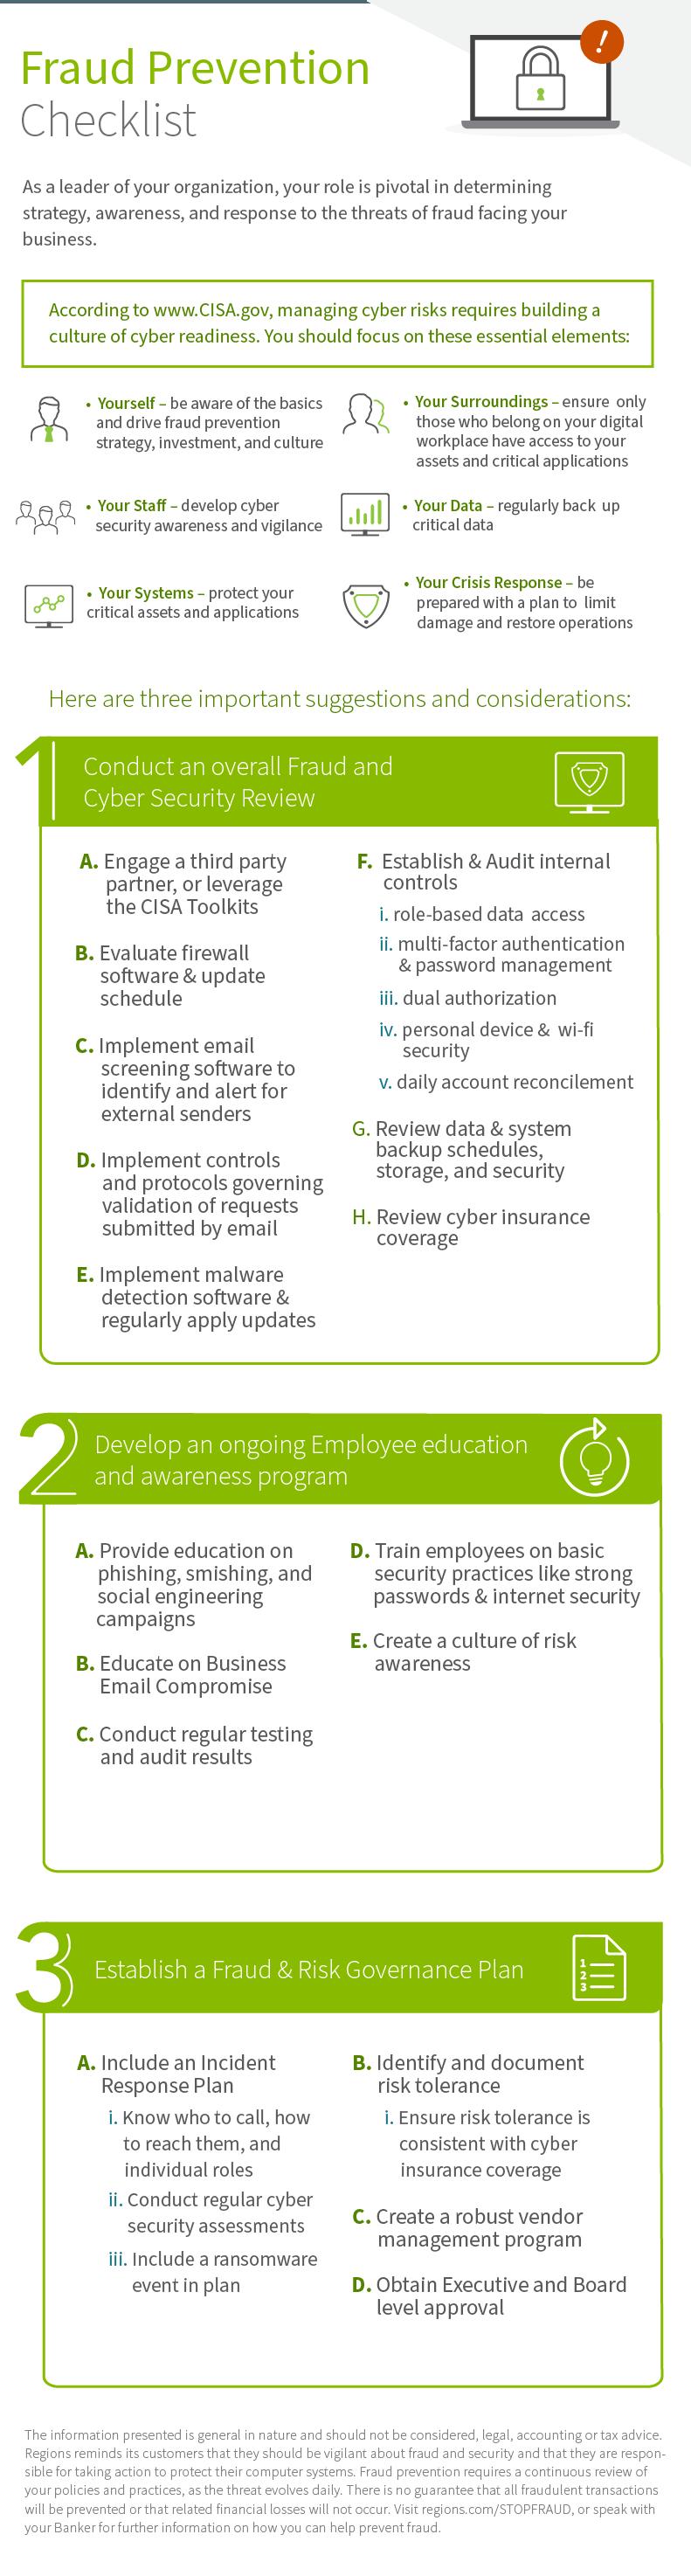 fraud prevention checklist infographic